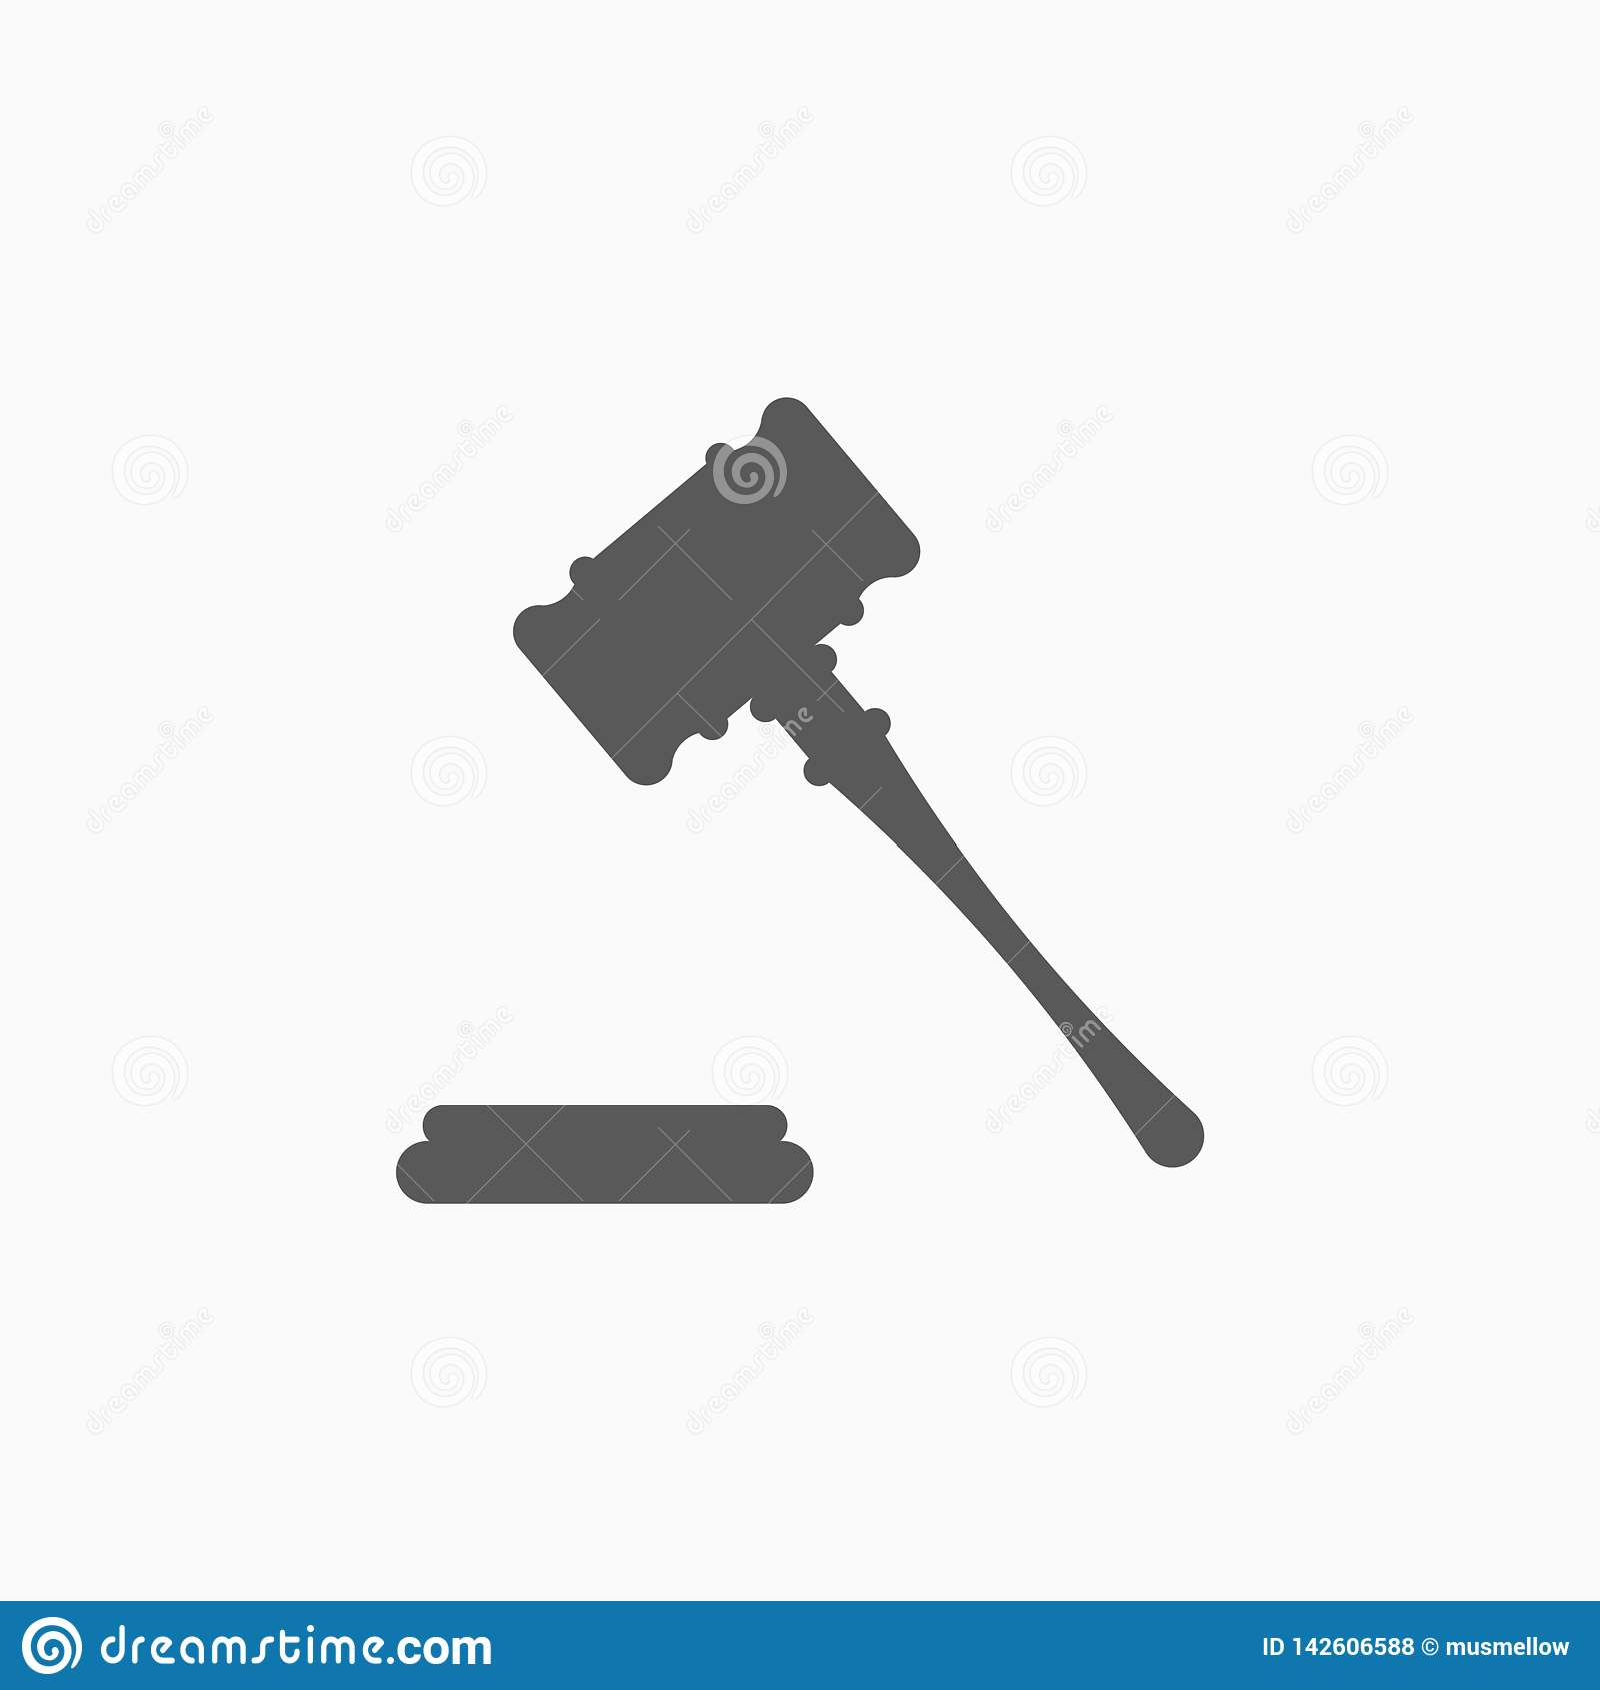 Значок молотка, молоток, судья, суждение, молоток аукциона